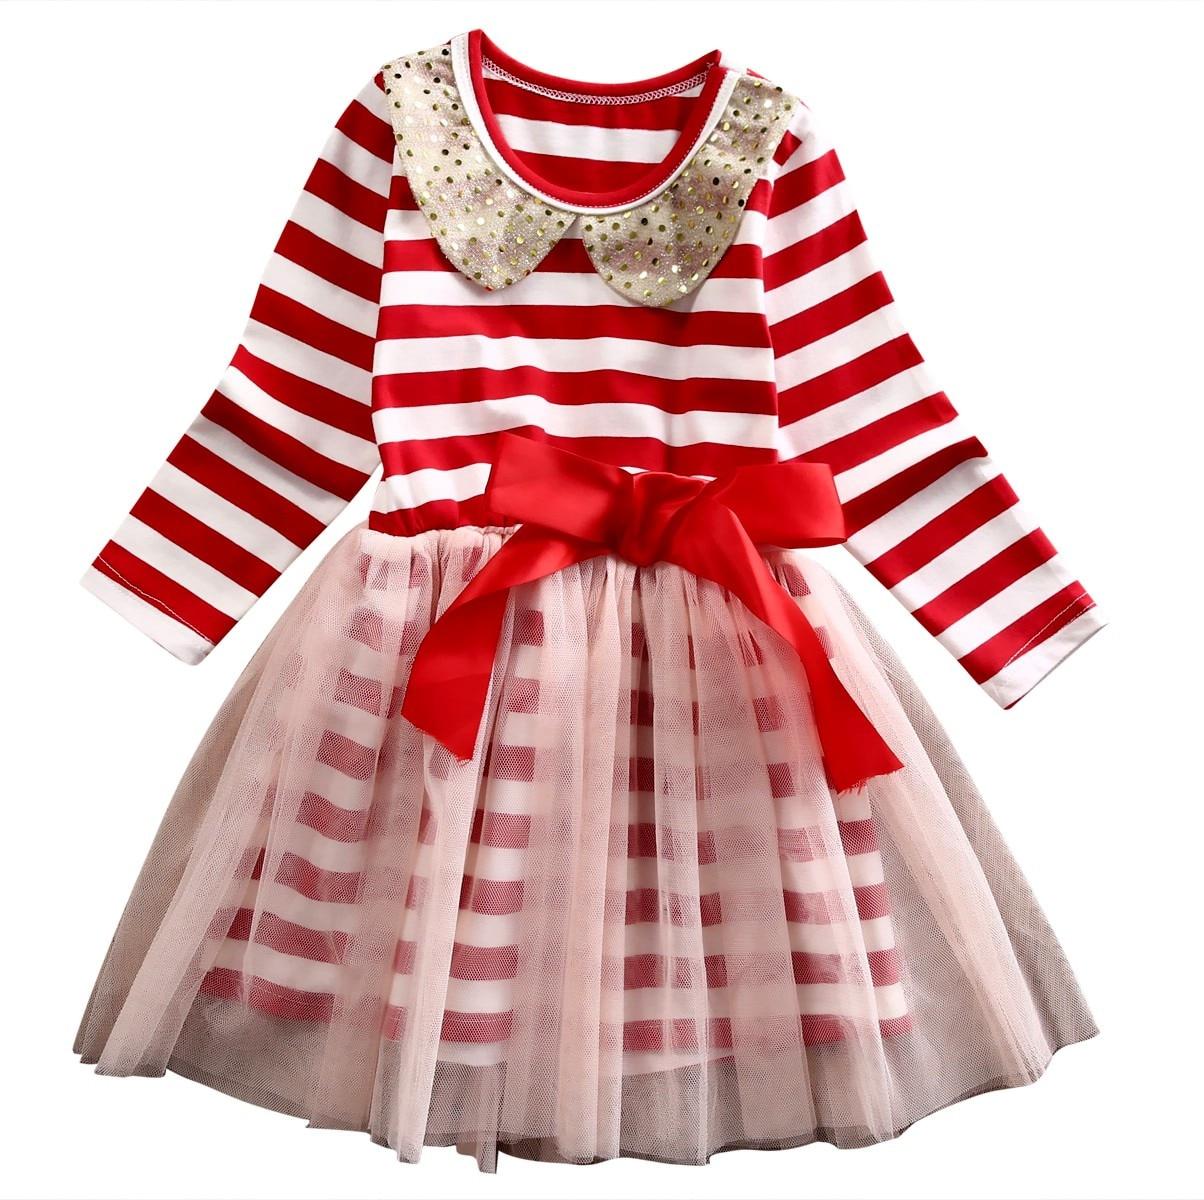 34af480d7192f Tatil Çocuklar Bebek Kız Prenses Şerit Uzun Kollu Tül Parti Elbise Elbise